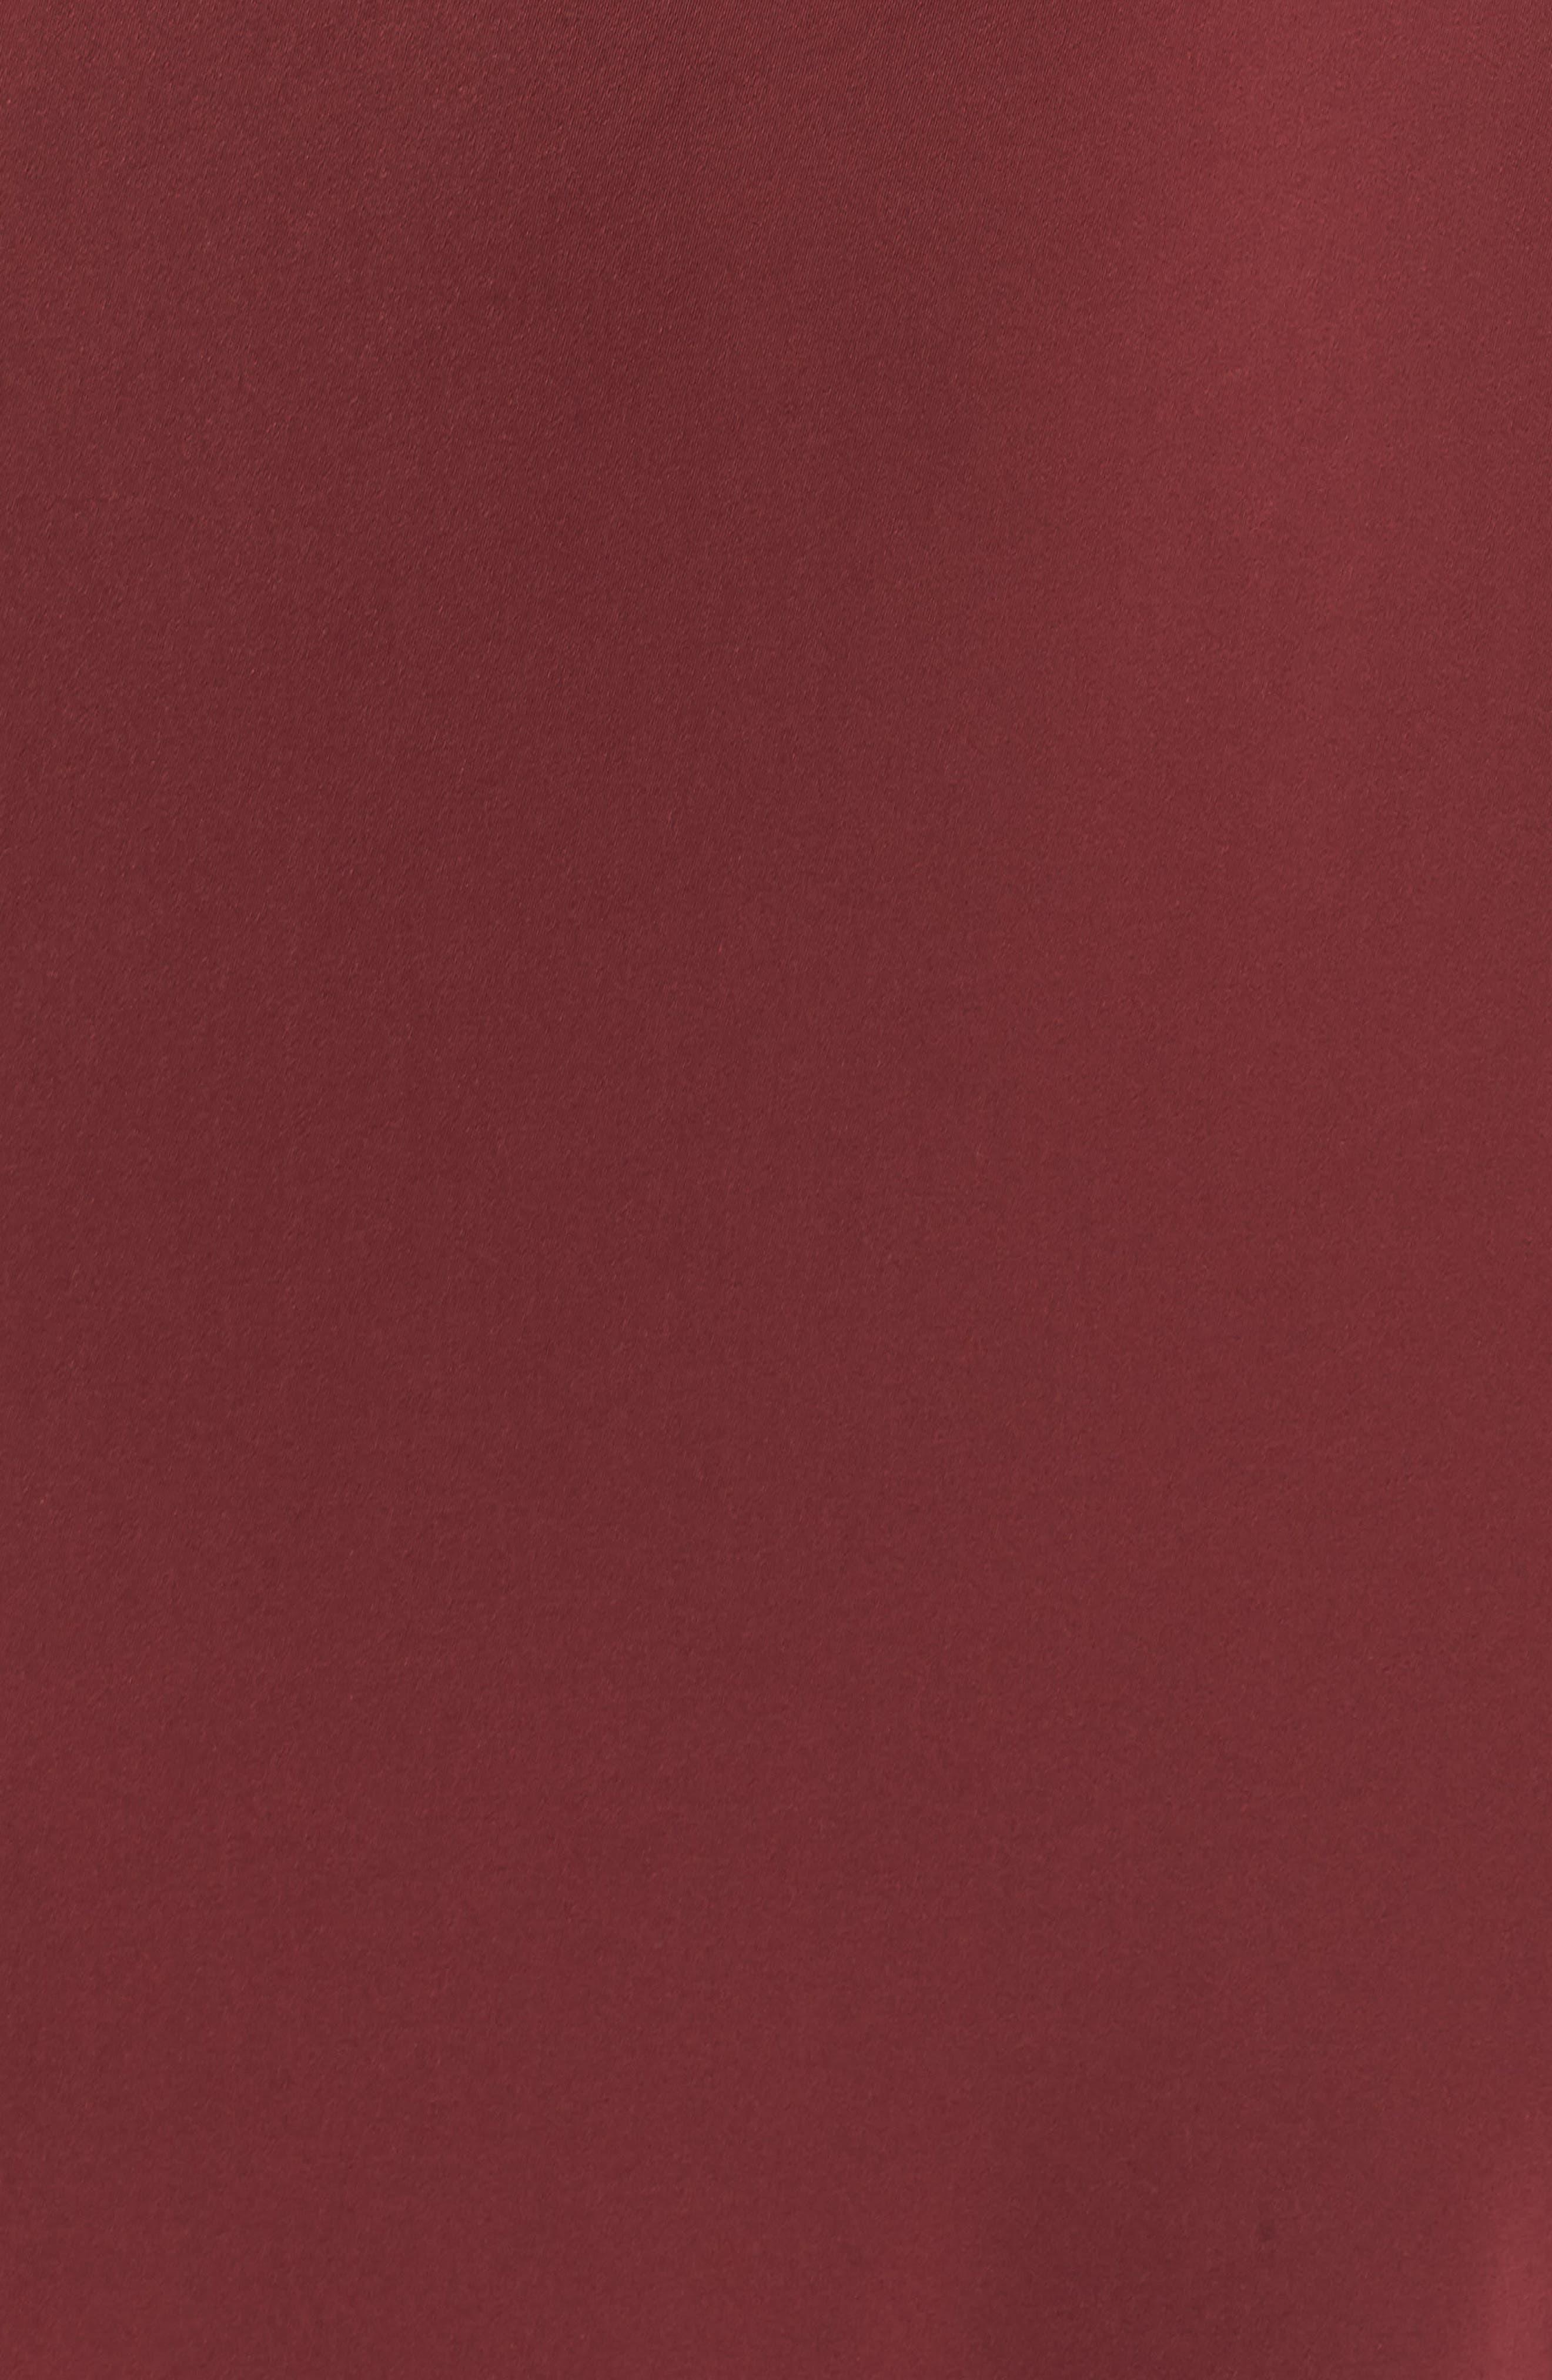 Jelina One-Shoulder Gown,                             Alternate thumbnail 5, color,                             600